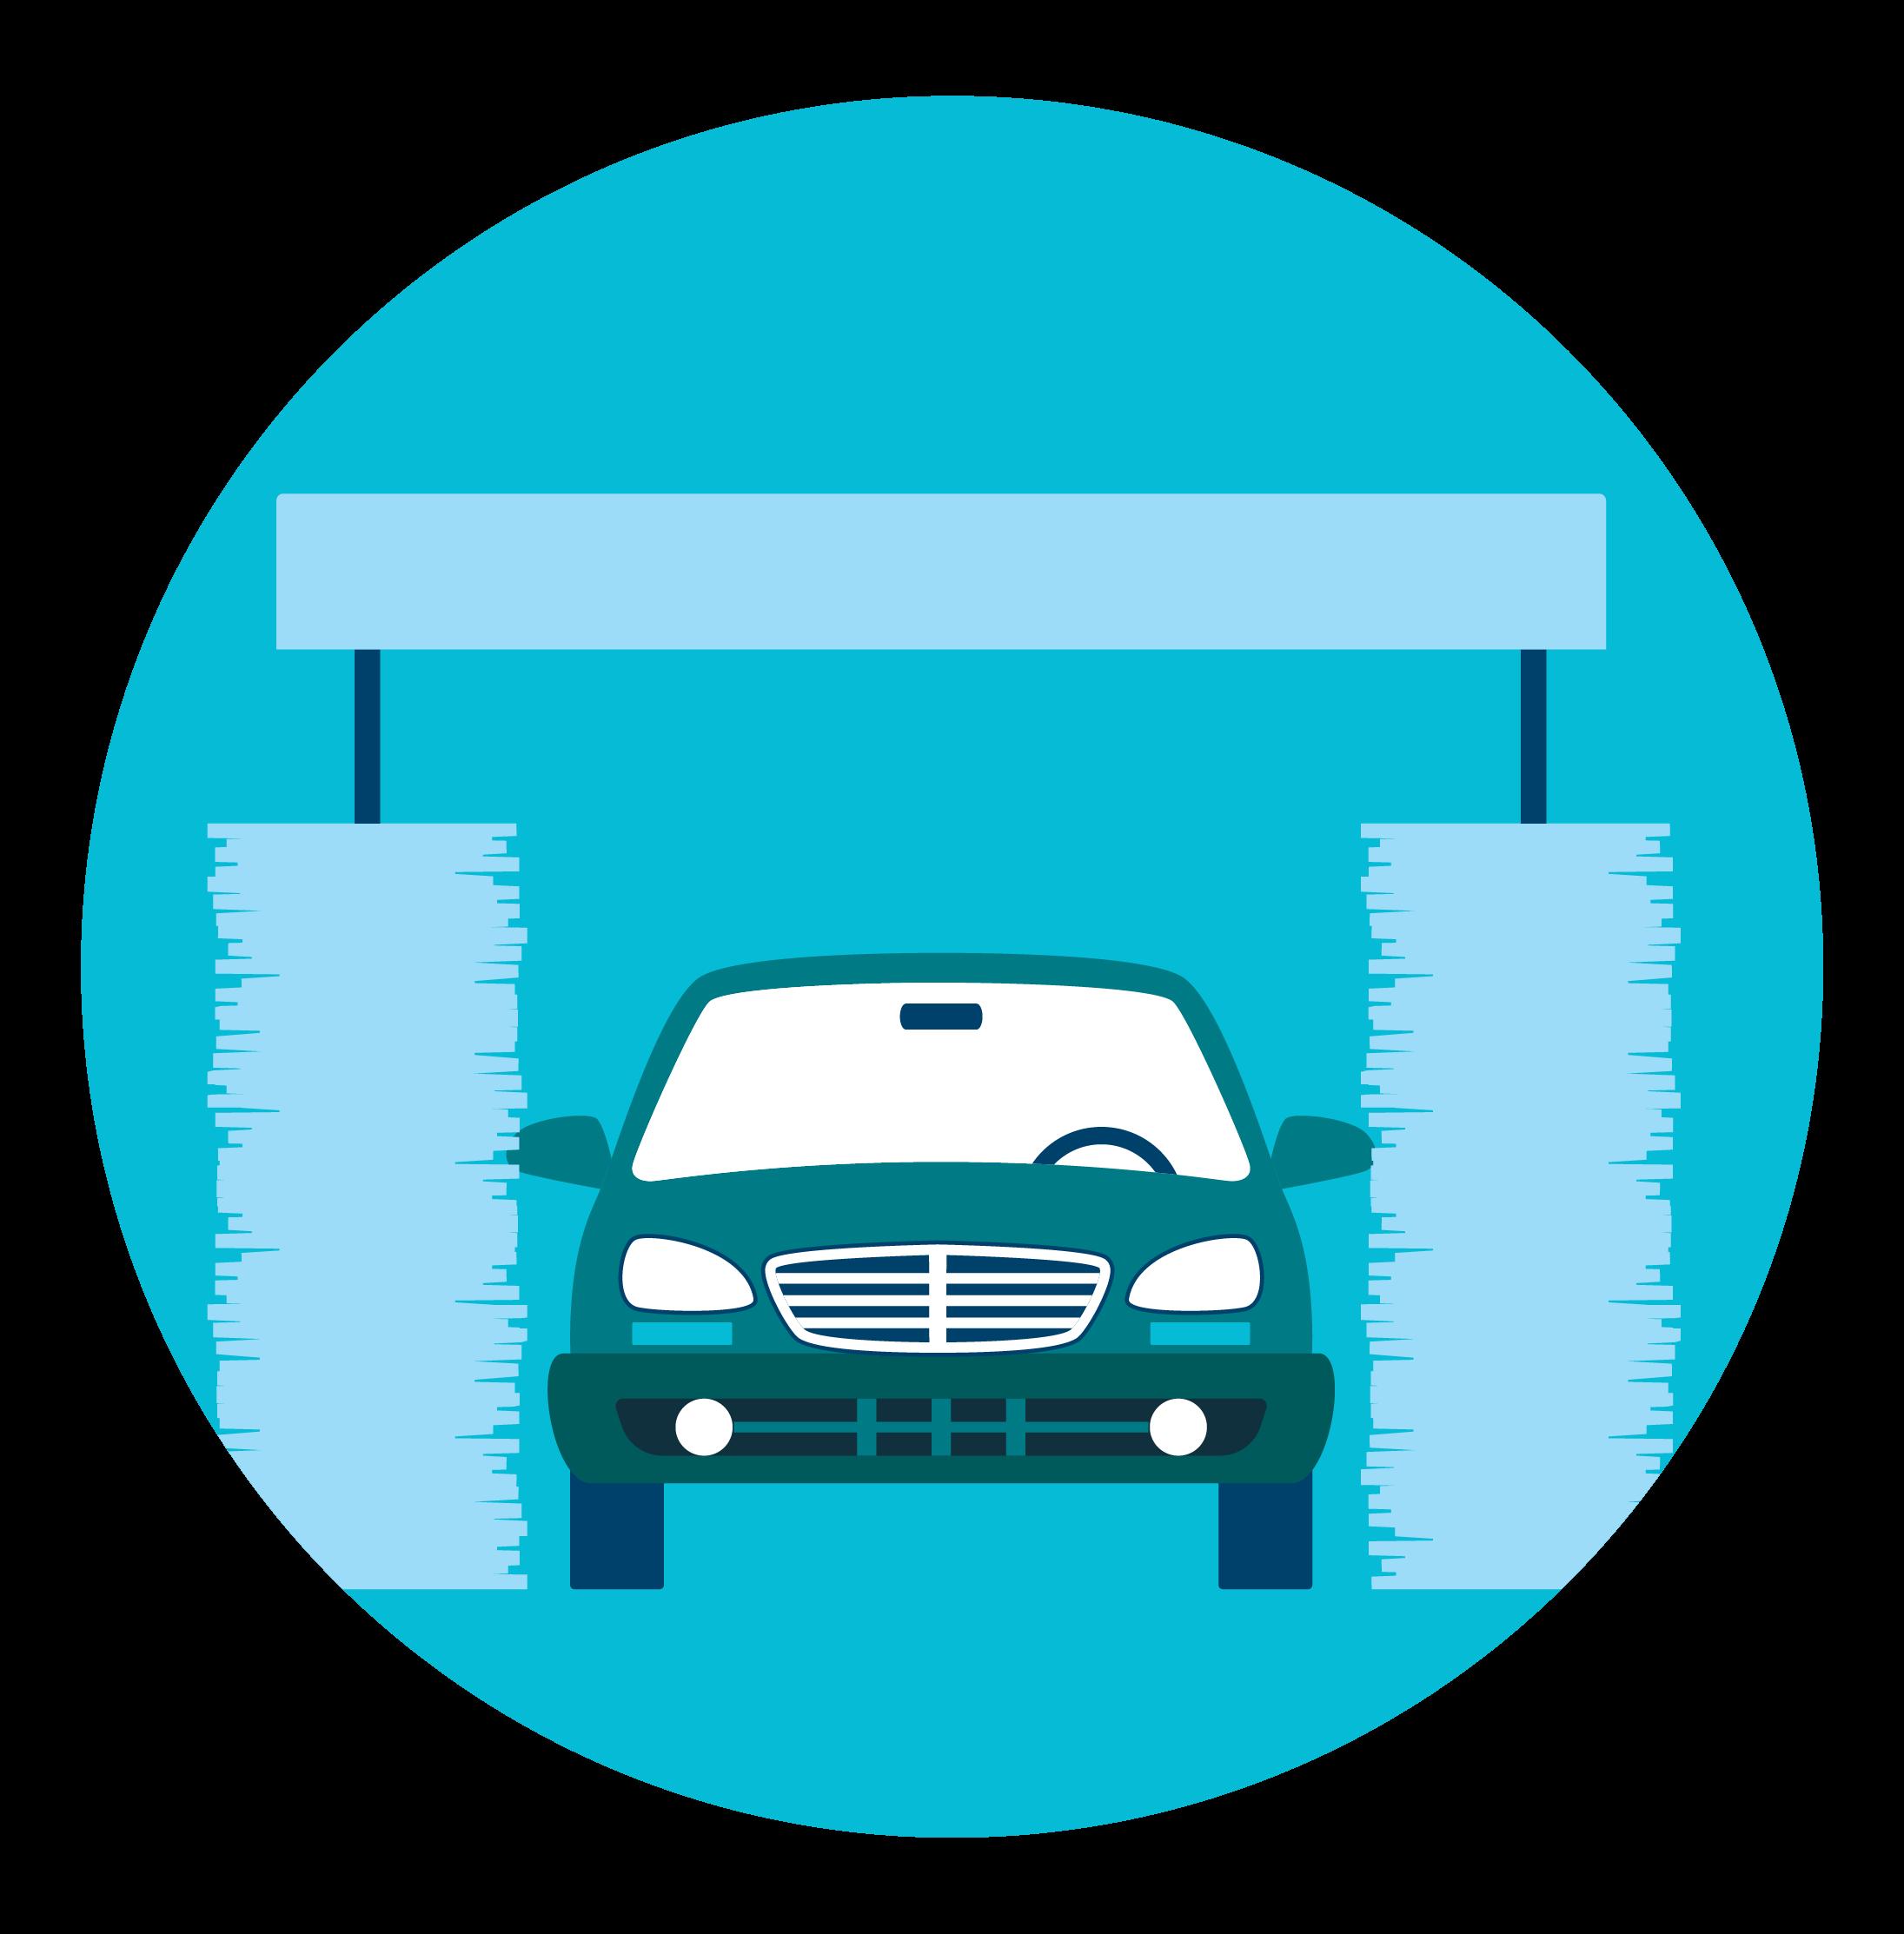 carwash icon